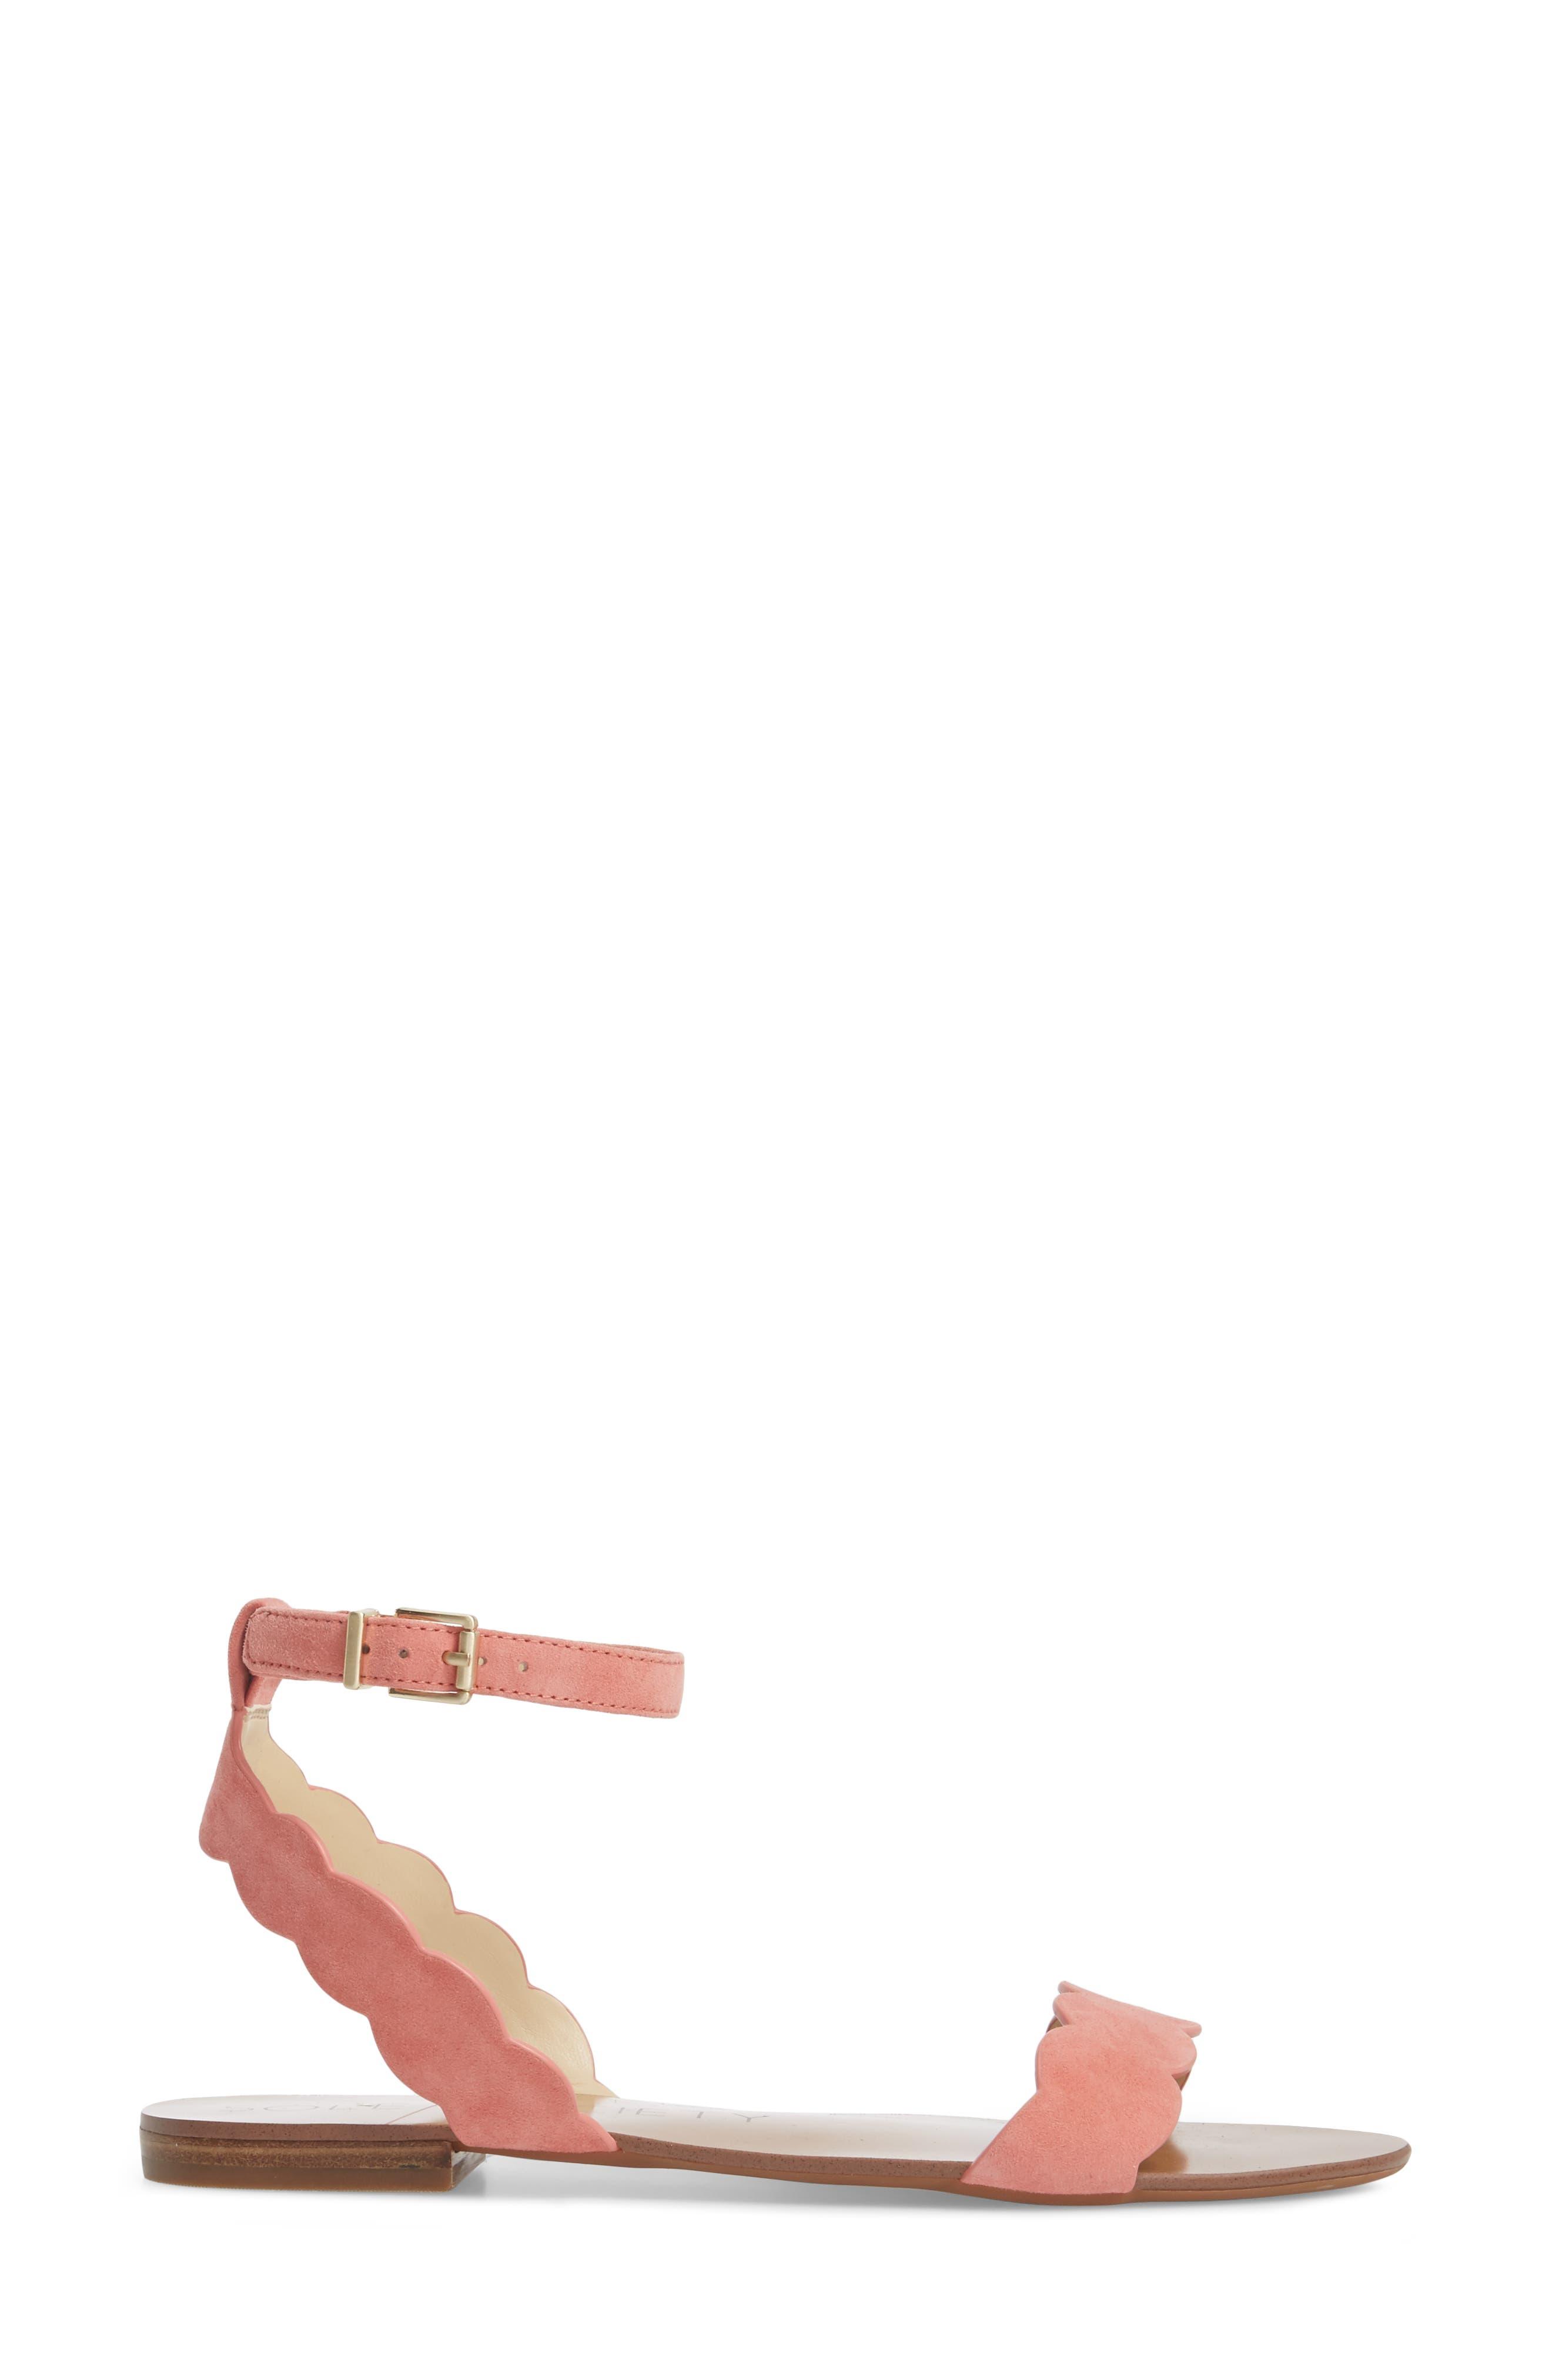 'Odette' Scalloped Ankle Strap Flat Sandal,                             Alternate thumbnail 16, color,